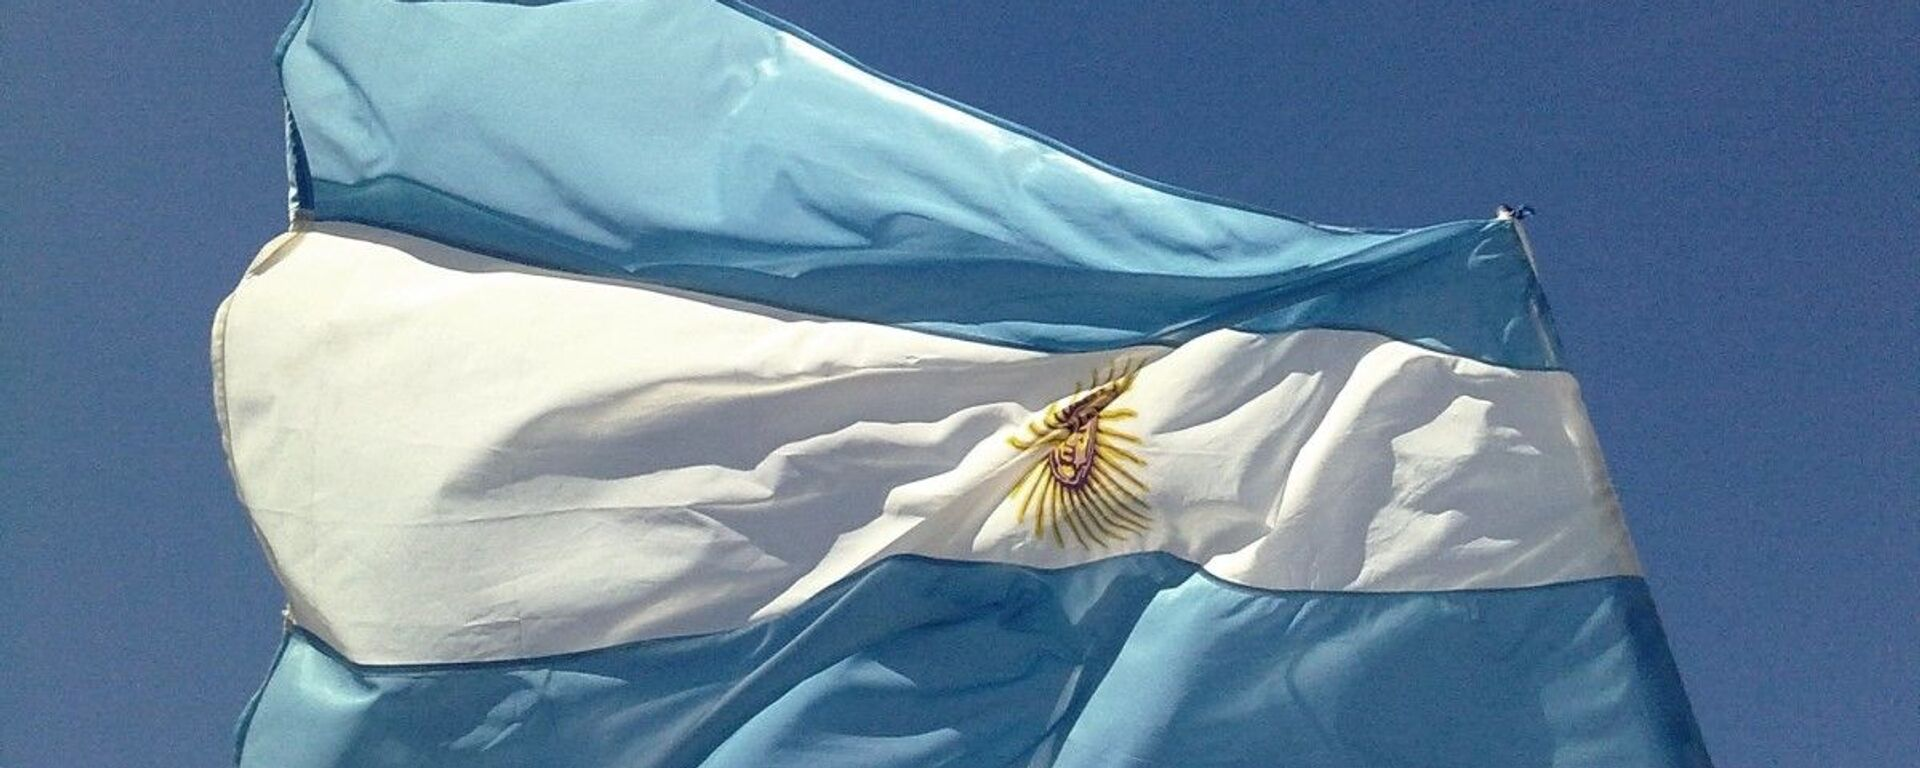 Bandera de Argentina - Sputnik Mundo, 1920, 02.09.2021